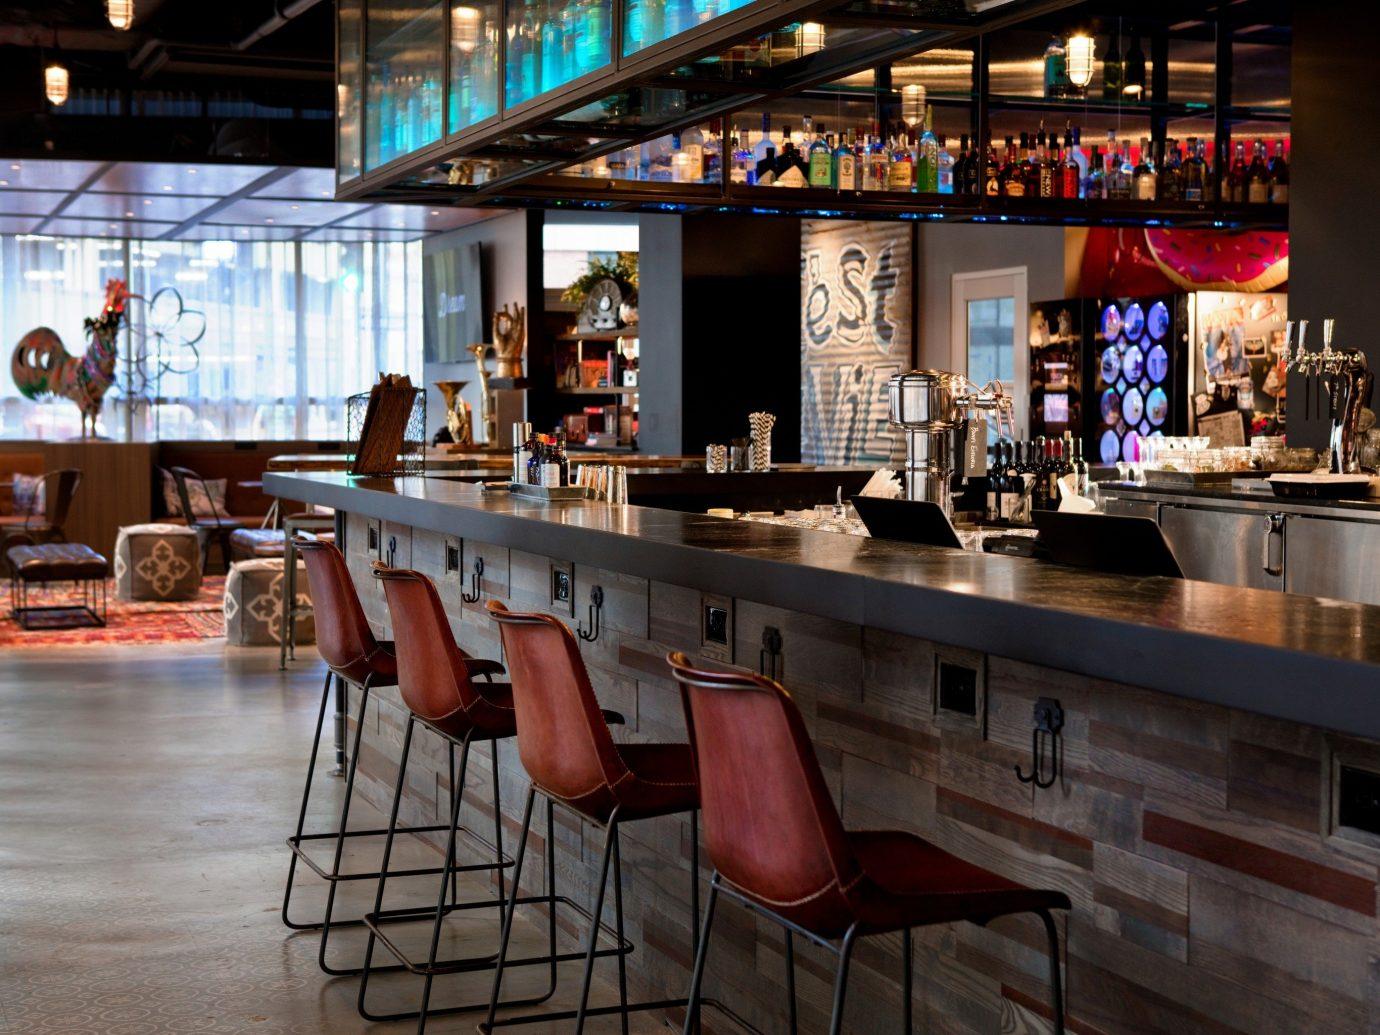 Boutique Hotels indoor floor window ceiling restaurant Bar meal café interior design table area furniture several Island